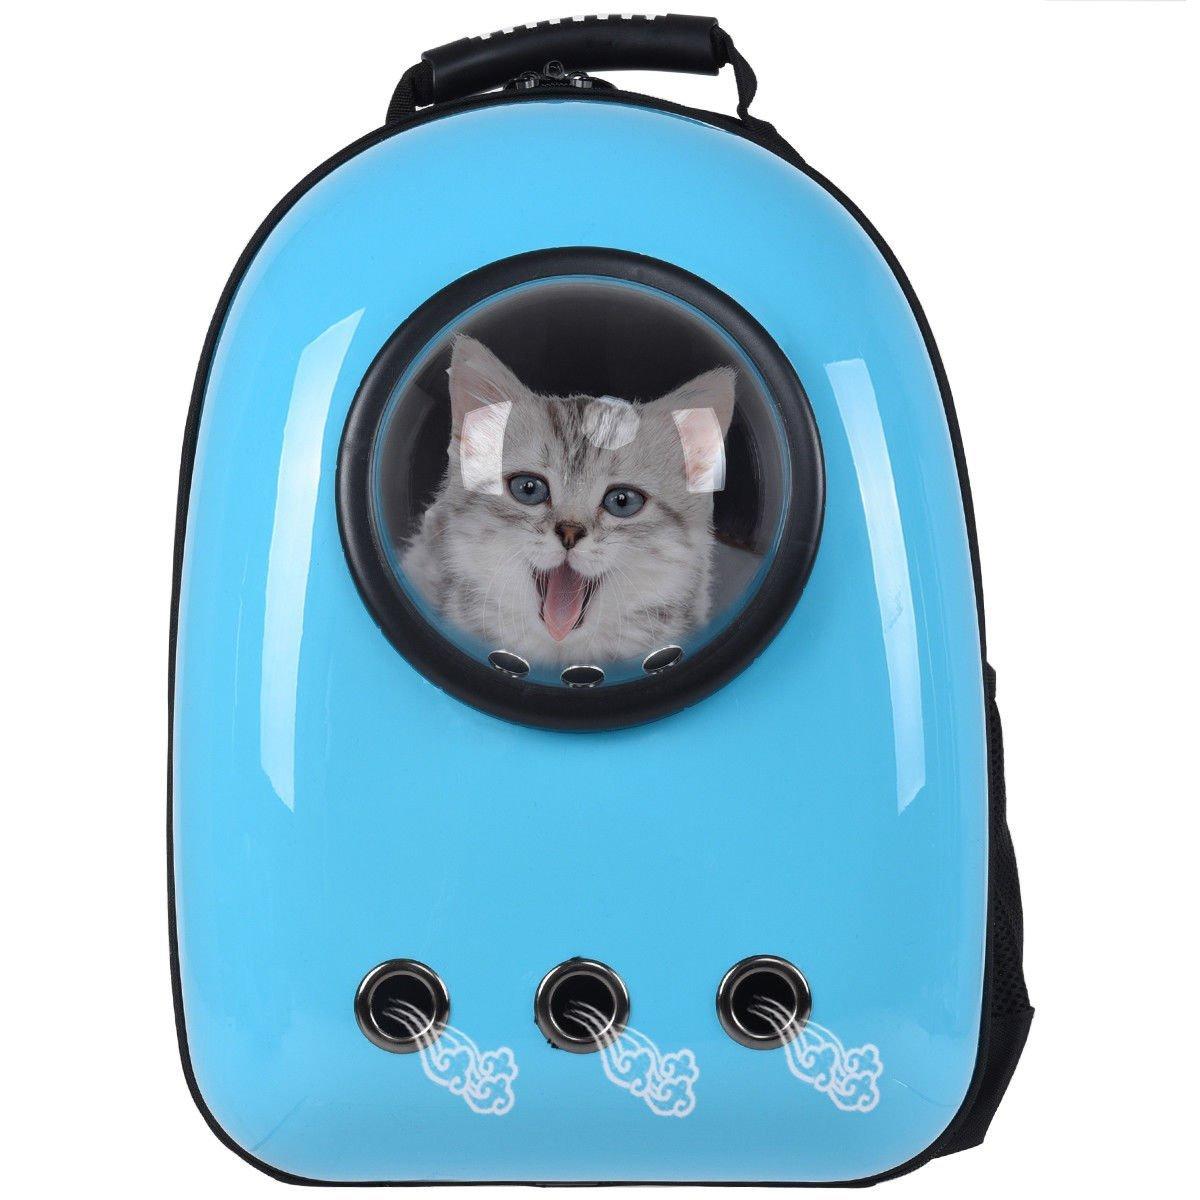 Giantex-Astronaut-Pet-Cat-Dog-Puppy-Carrier-Light-Blue-Color